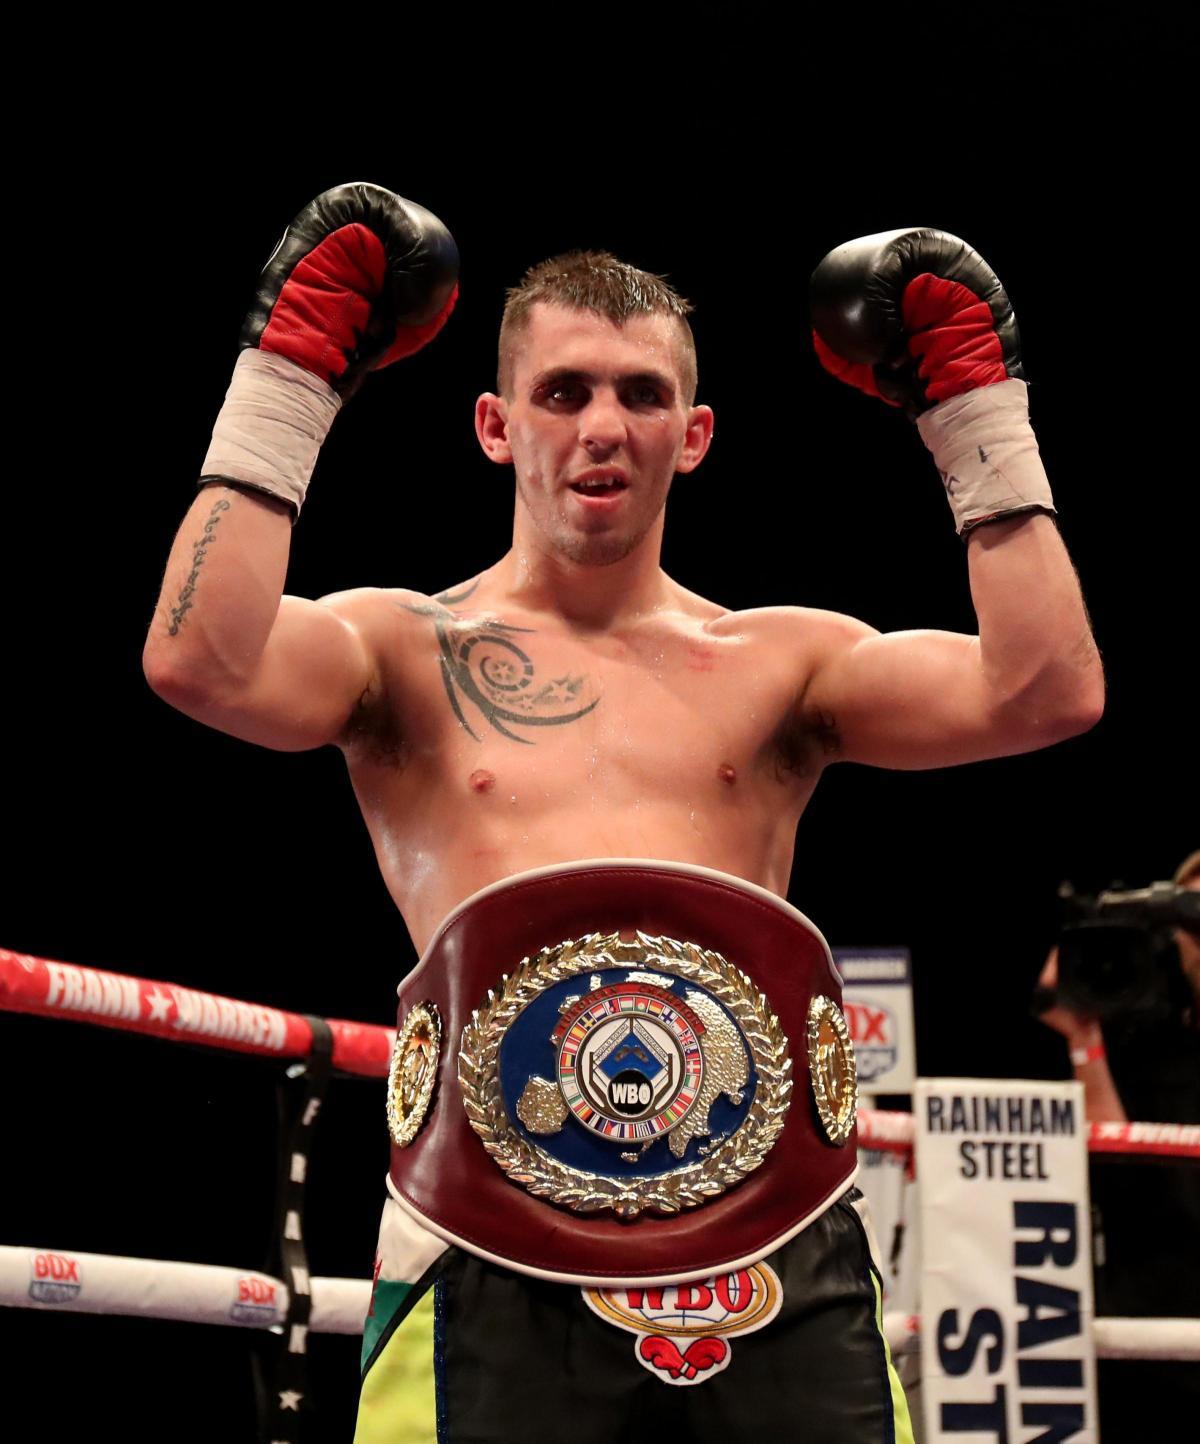 WBO | WBO European Lightweight Champion Craig Evans Faces